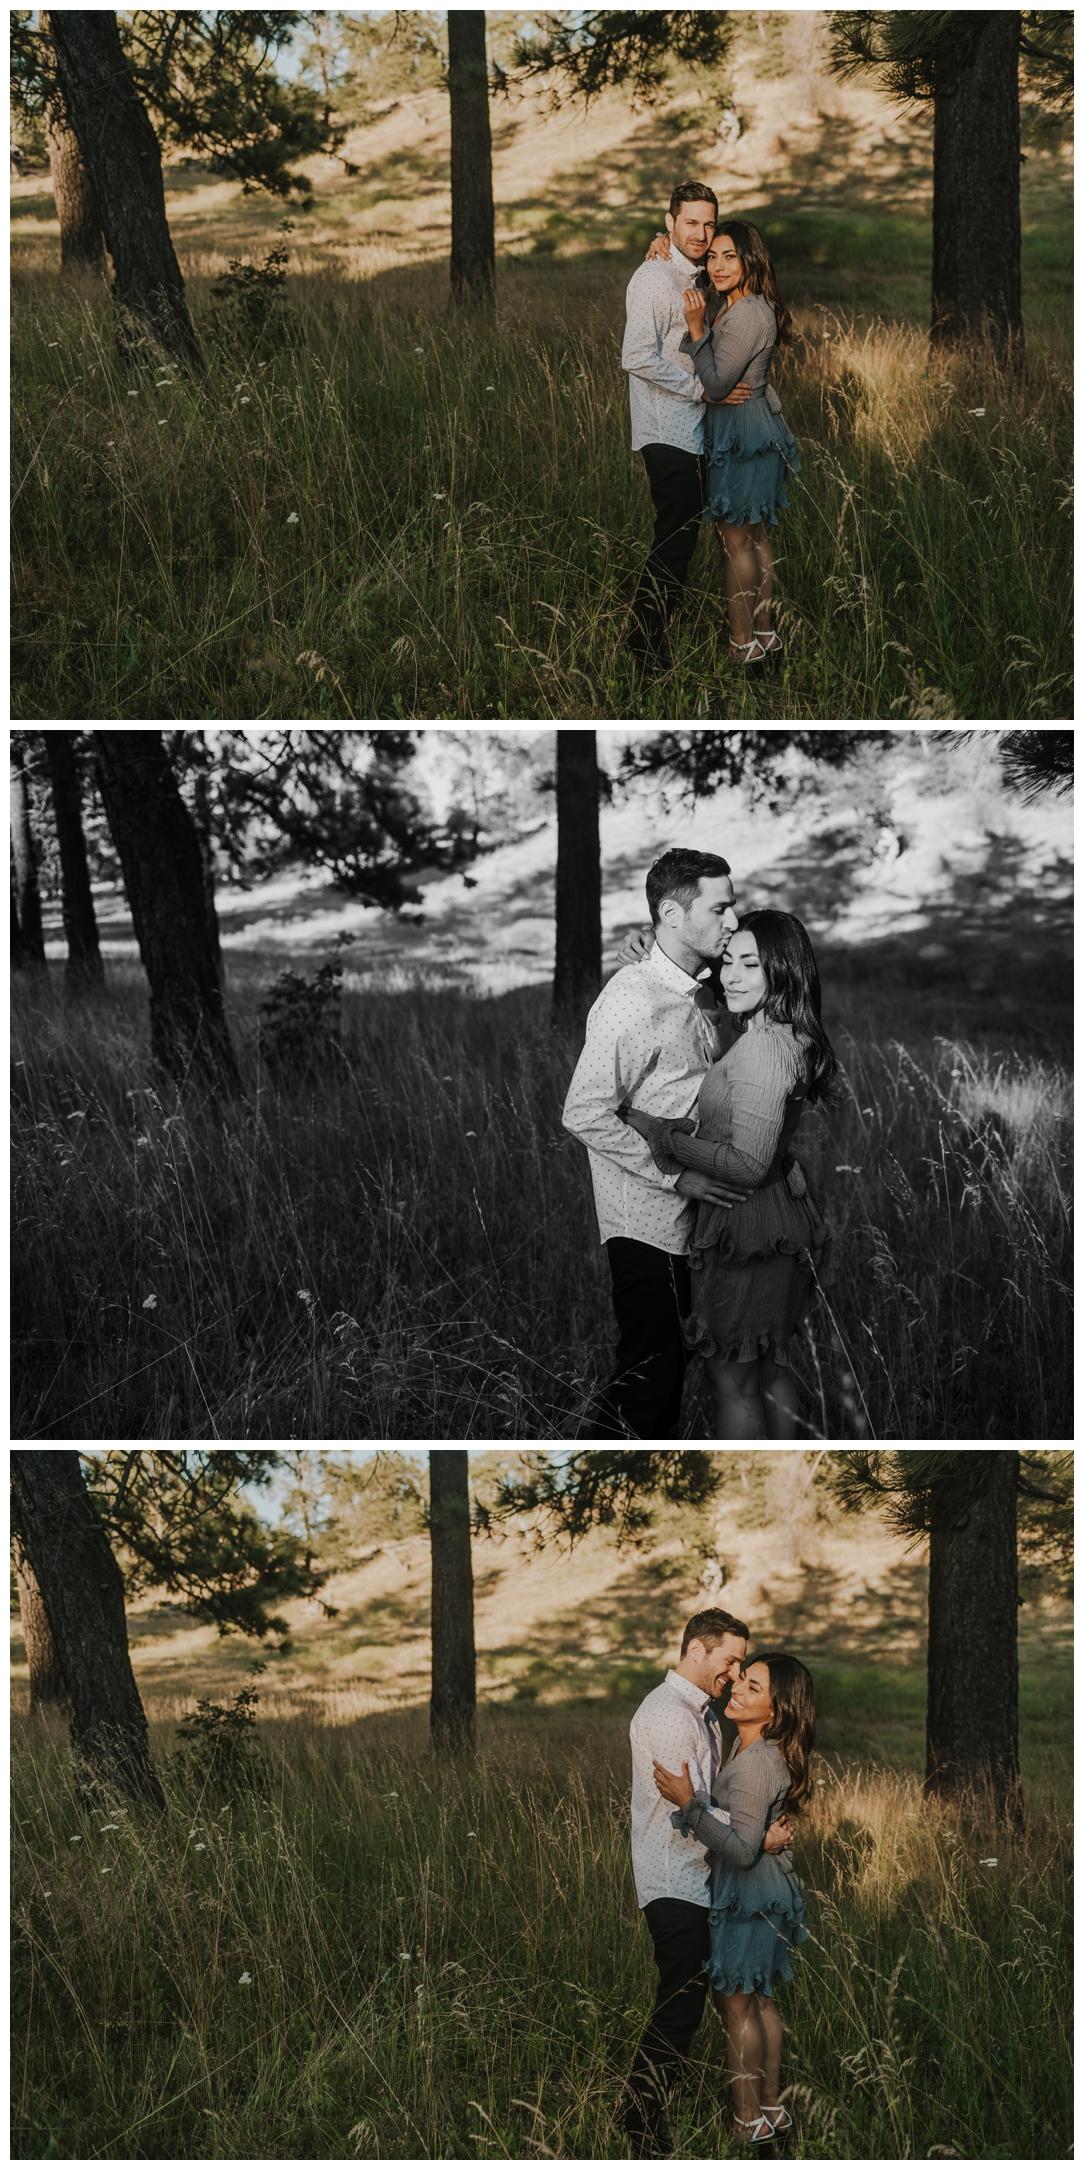 Mt-Laguna-Engagement-Photos_0015.jpg